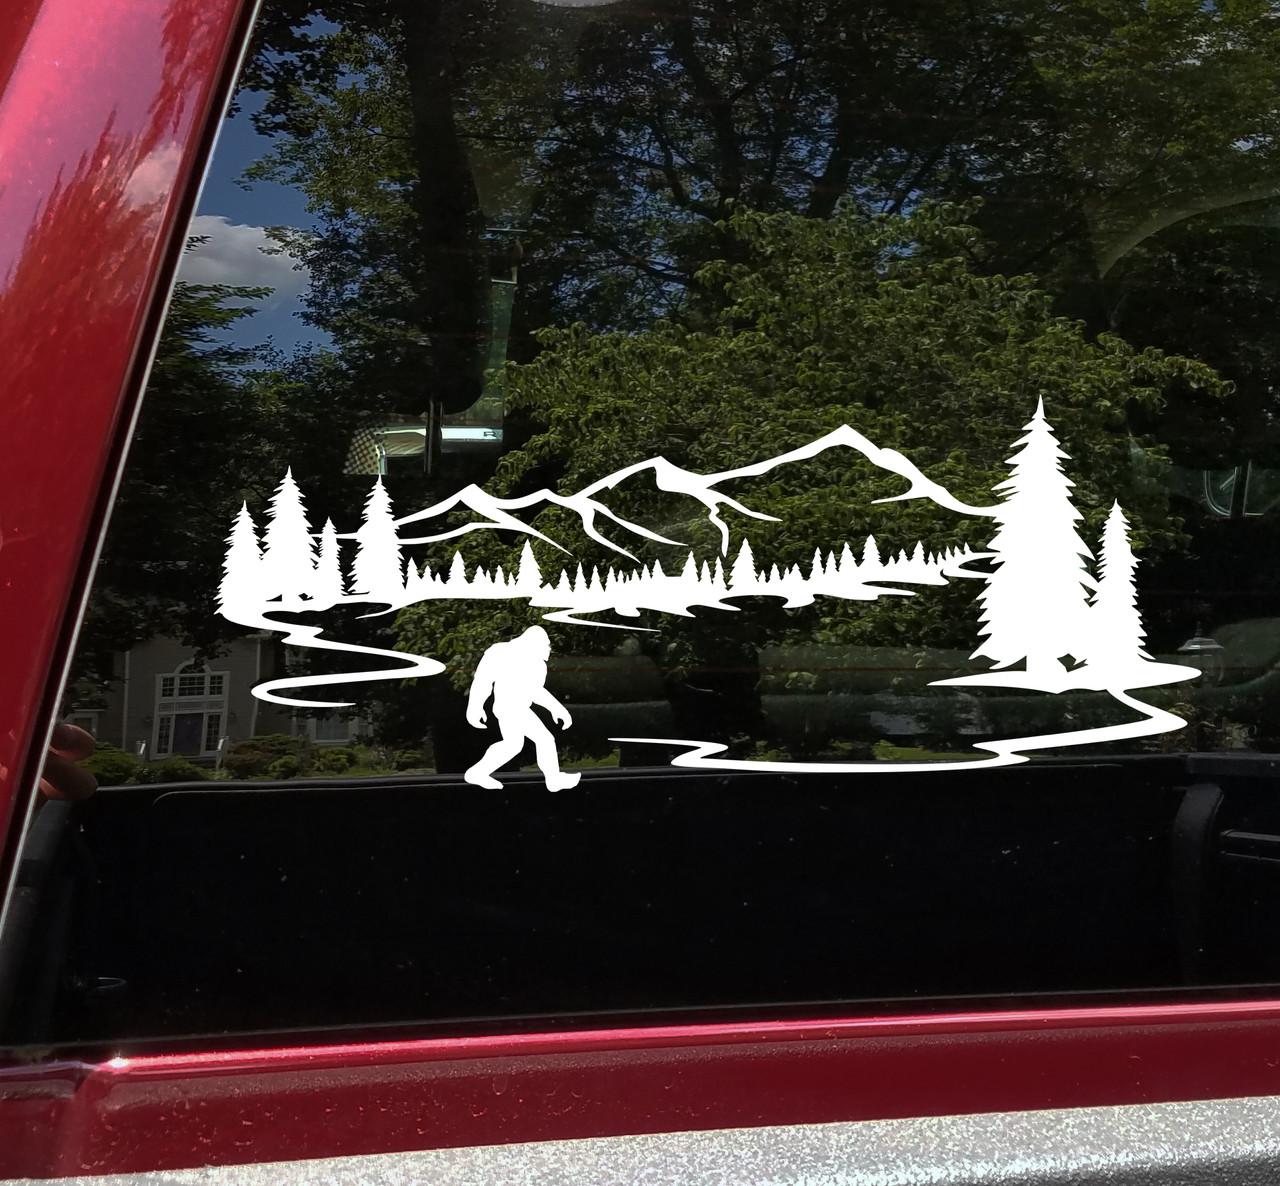 Bigfoot Mountains Forest Scenery V10 - Sasquatch PNW RV Graphics Camper - Die Cut Sticker